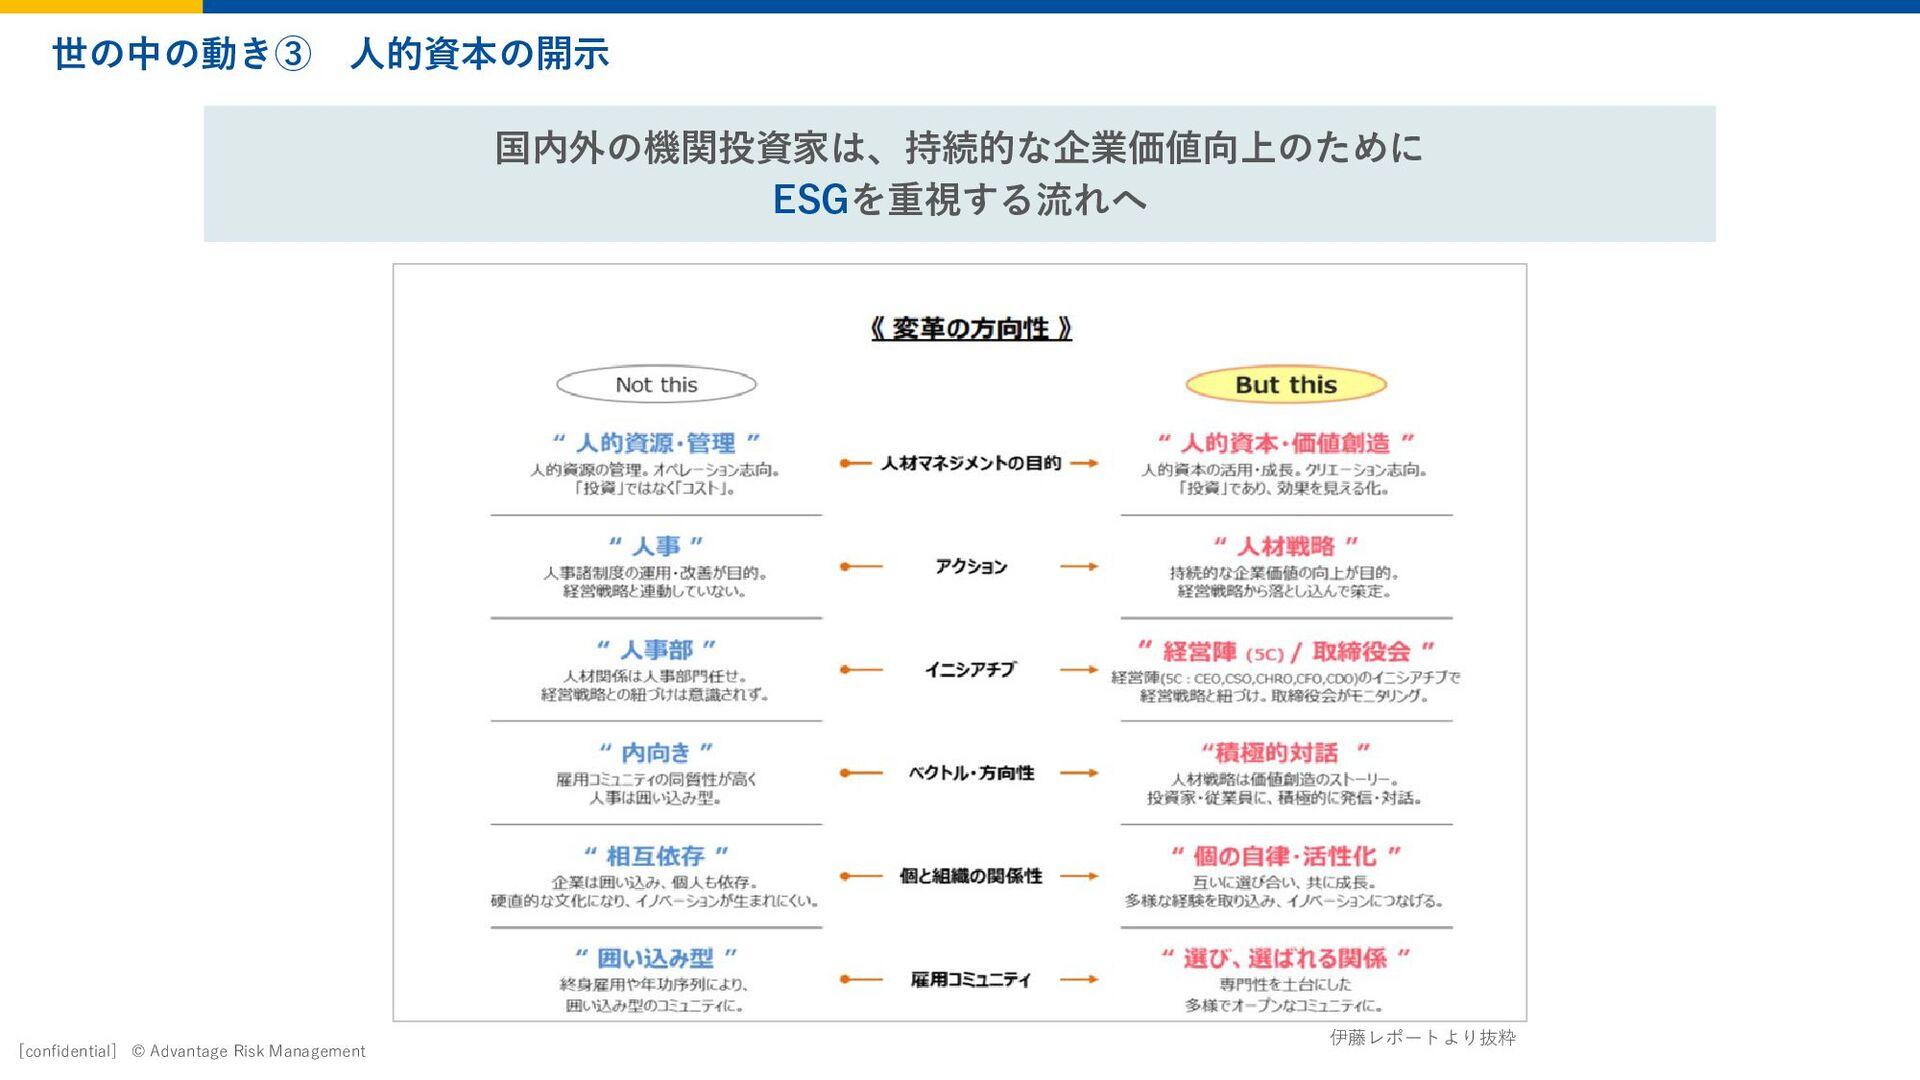 Page 25 2020 Advantage Risk Management © 福利厚生、制...